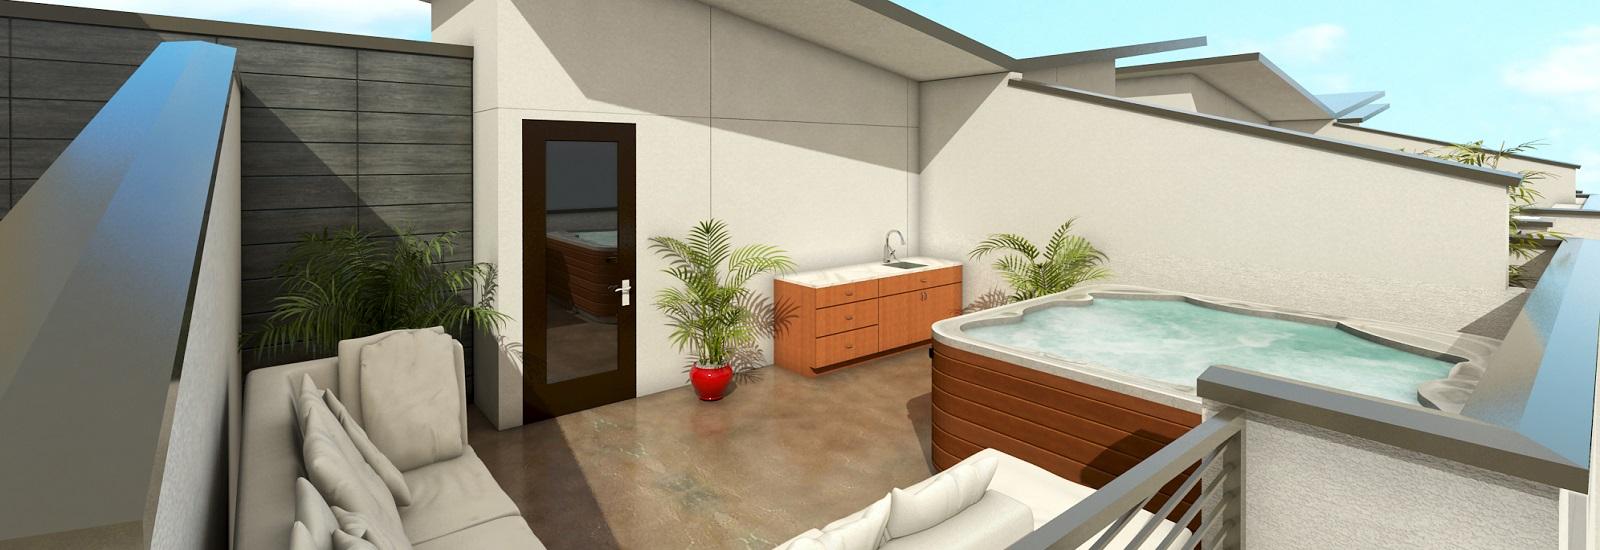 Artisan_RoofTop_1600x550.jpg